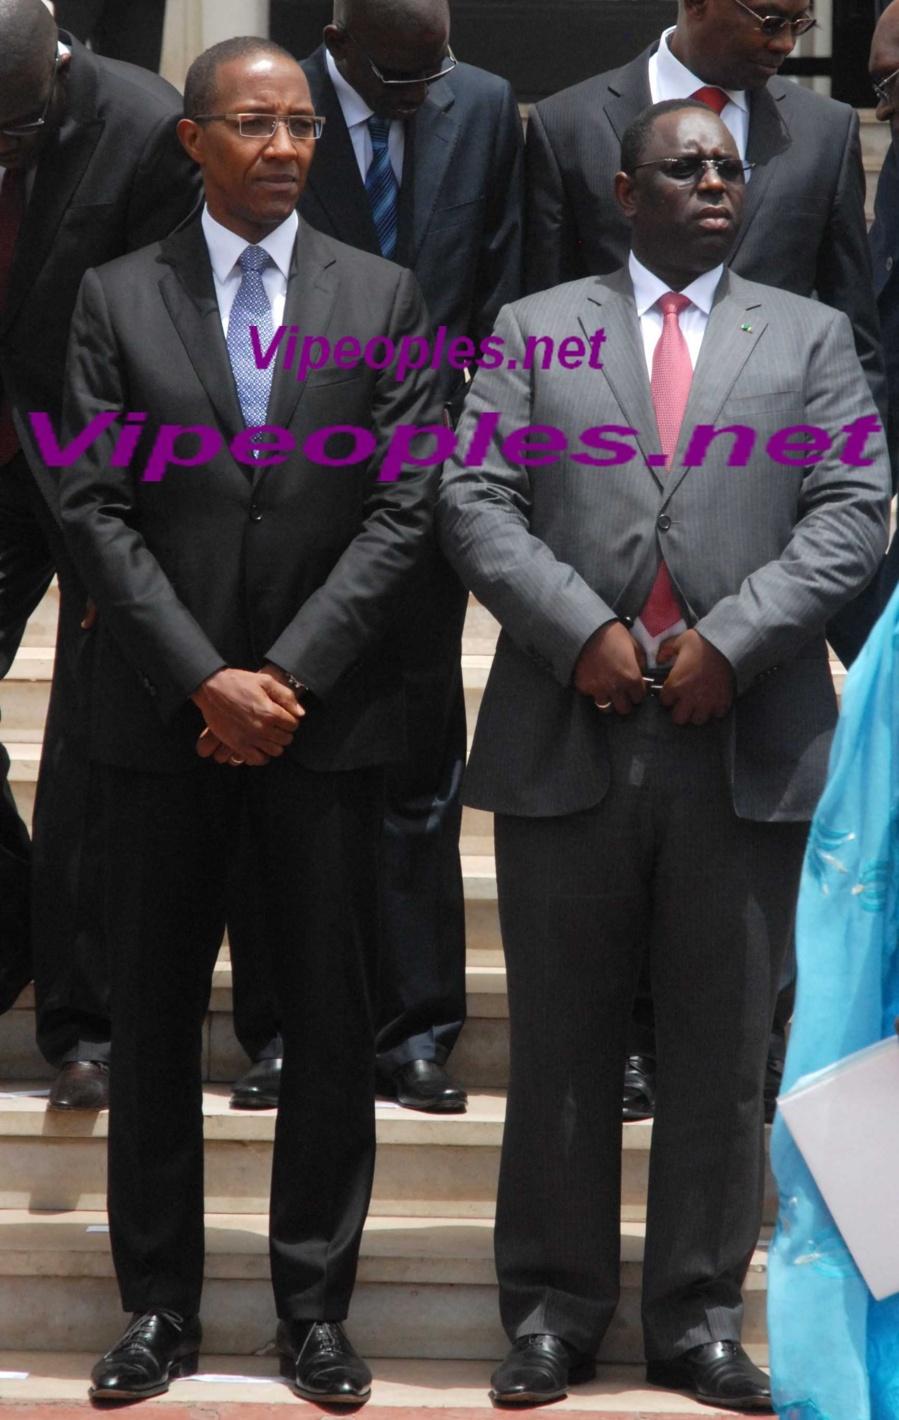 Macky Sall - Abdoul Mbaye: Du passé présent